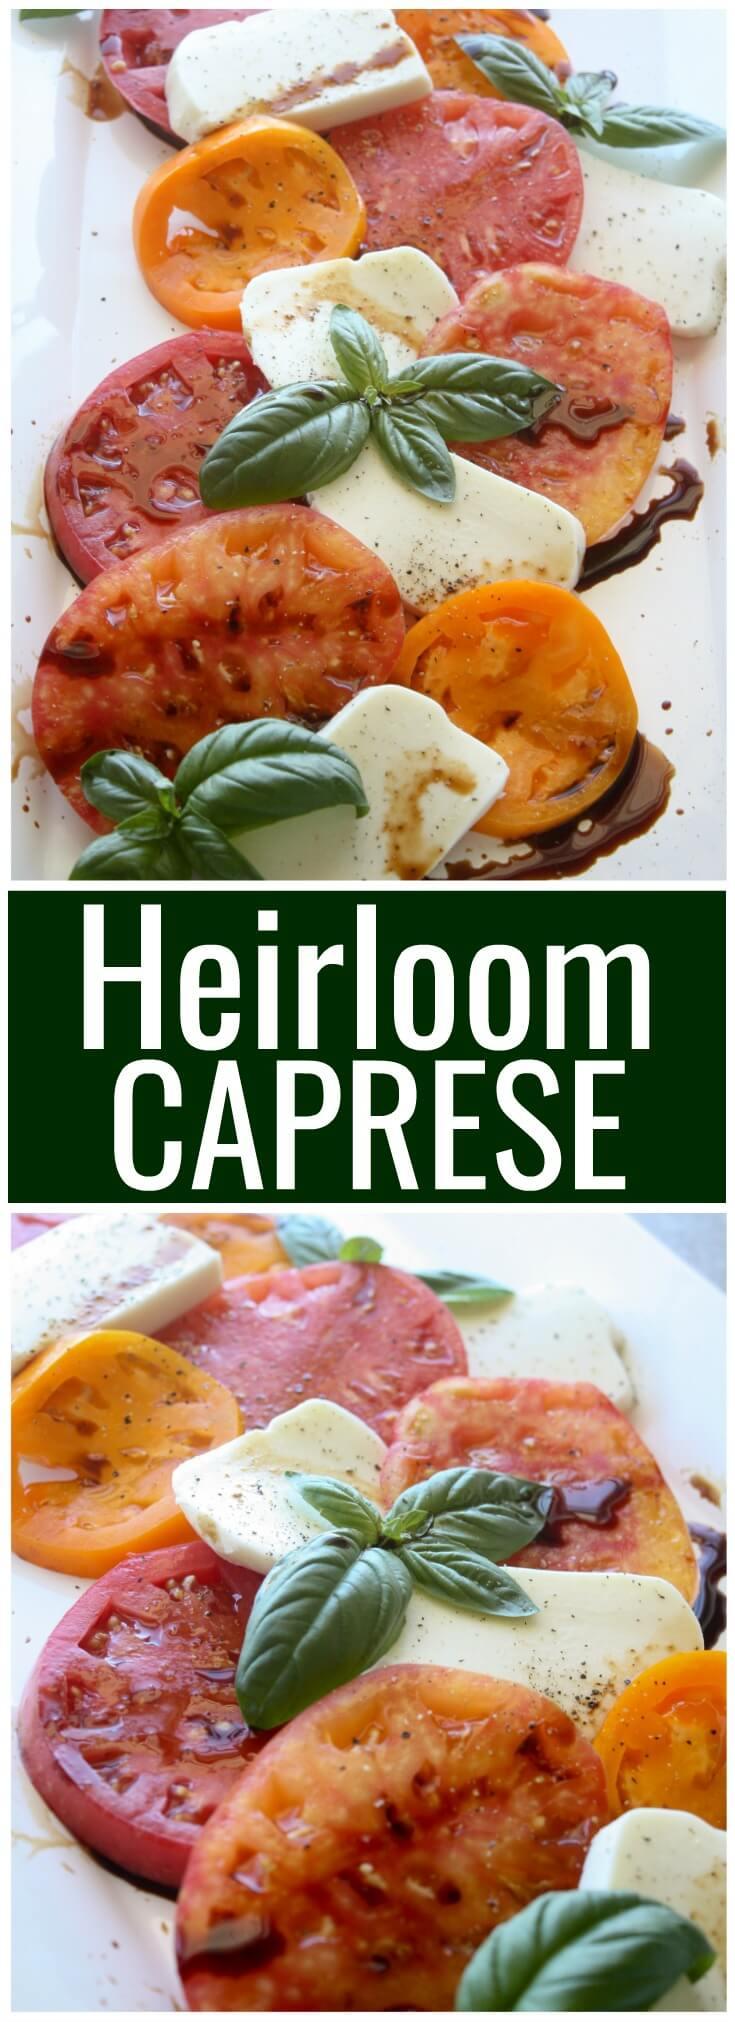 Heirloom Caprese Salad.